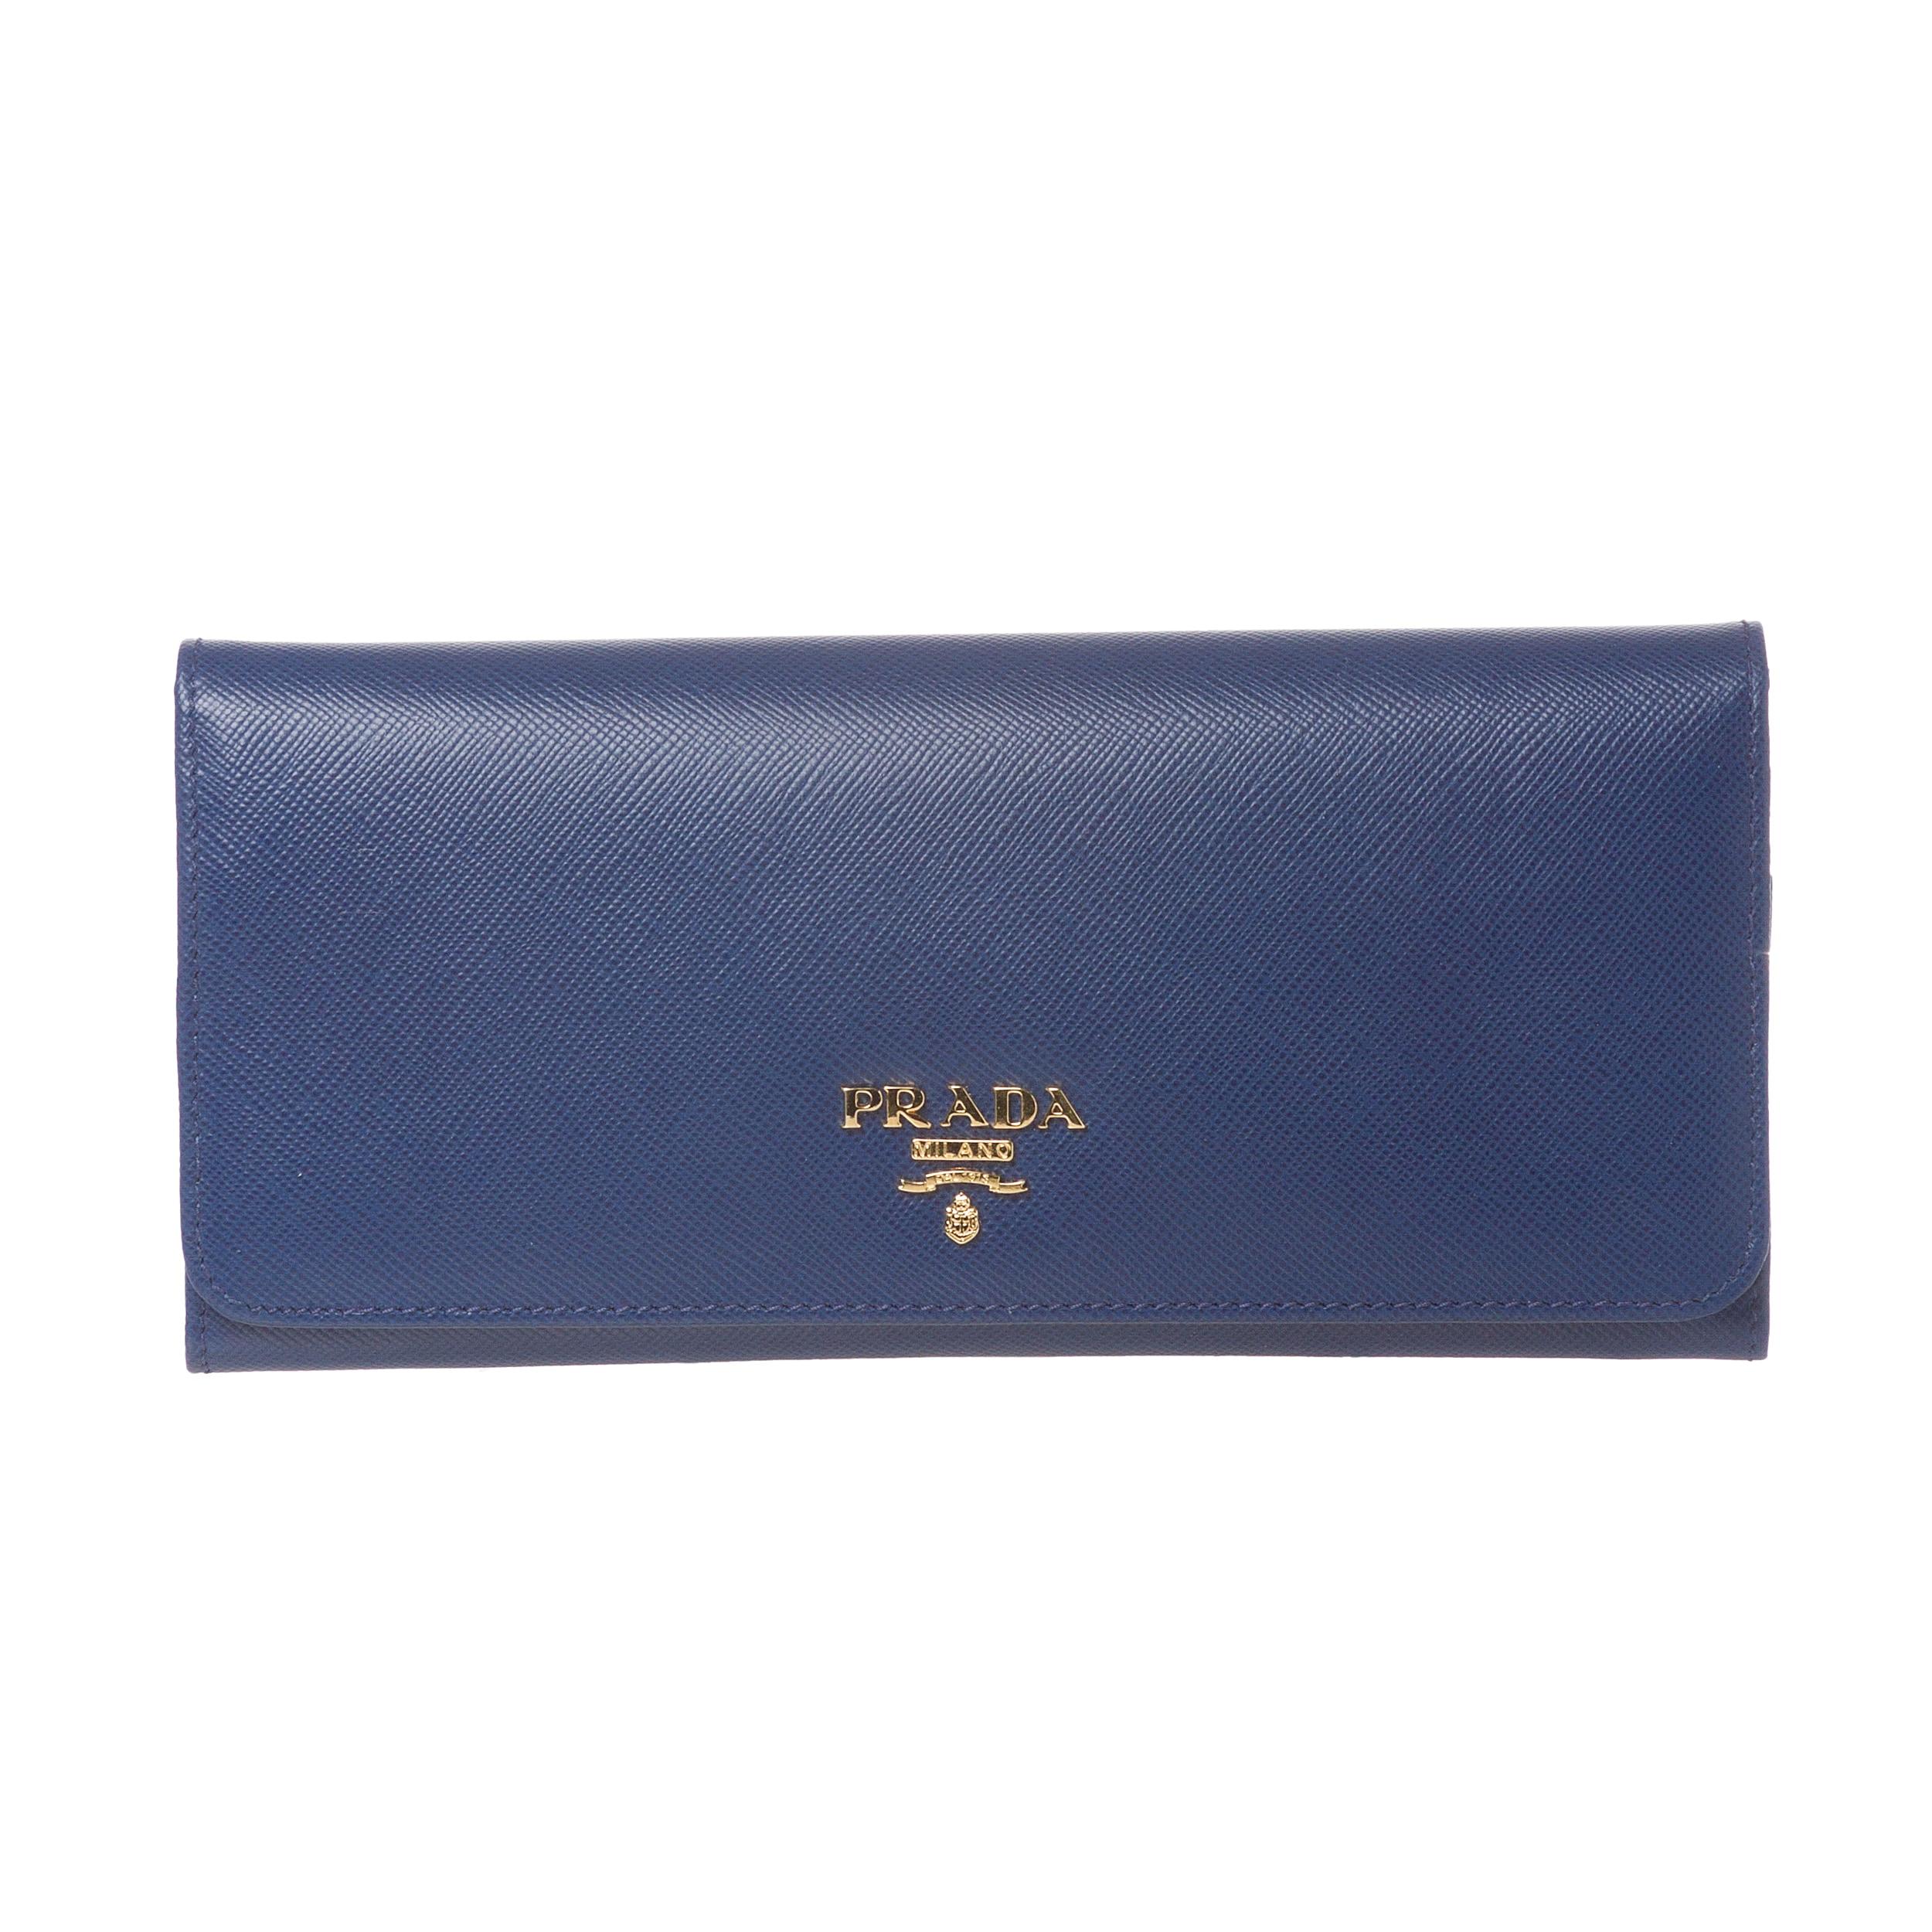 prada saffiano lux tote black - prada blue leather wallet